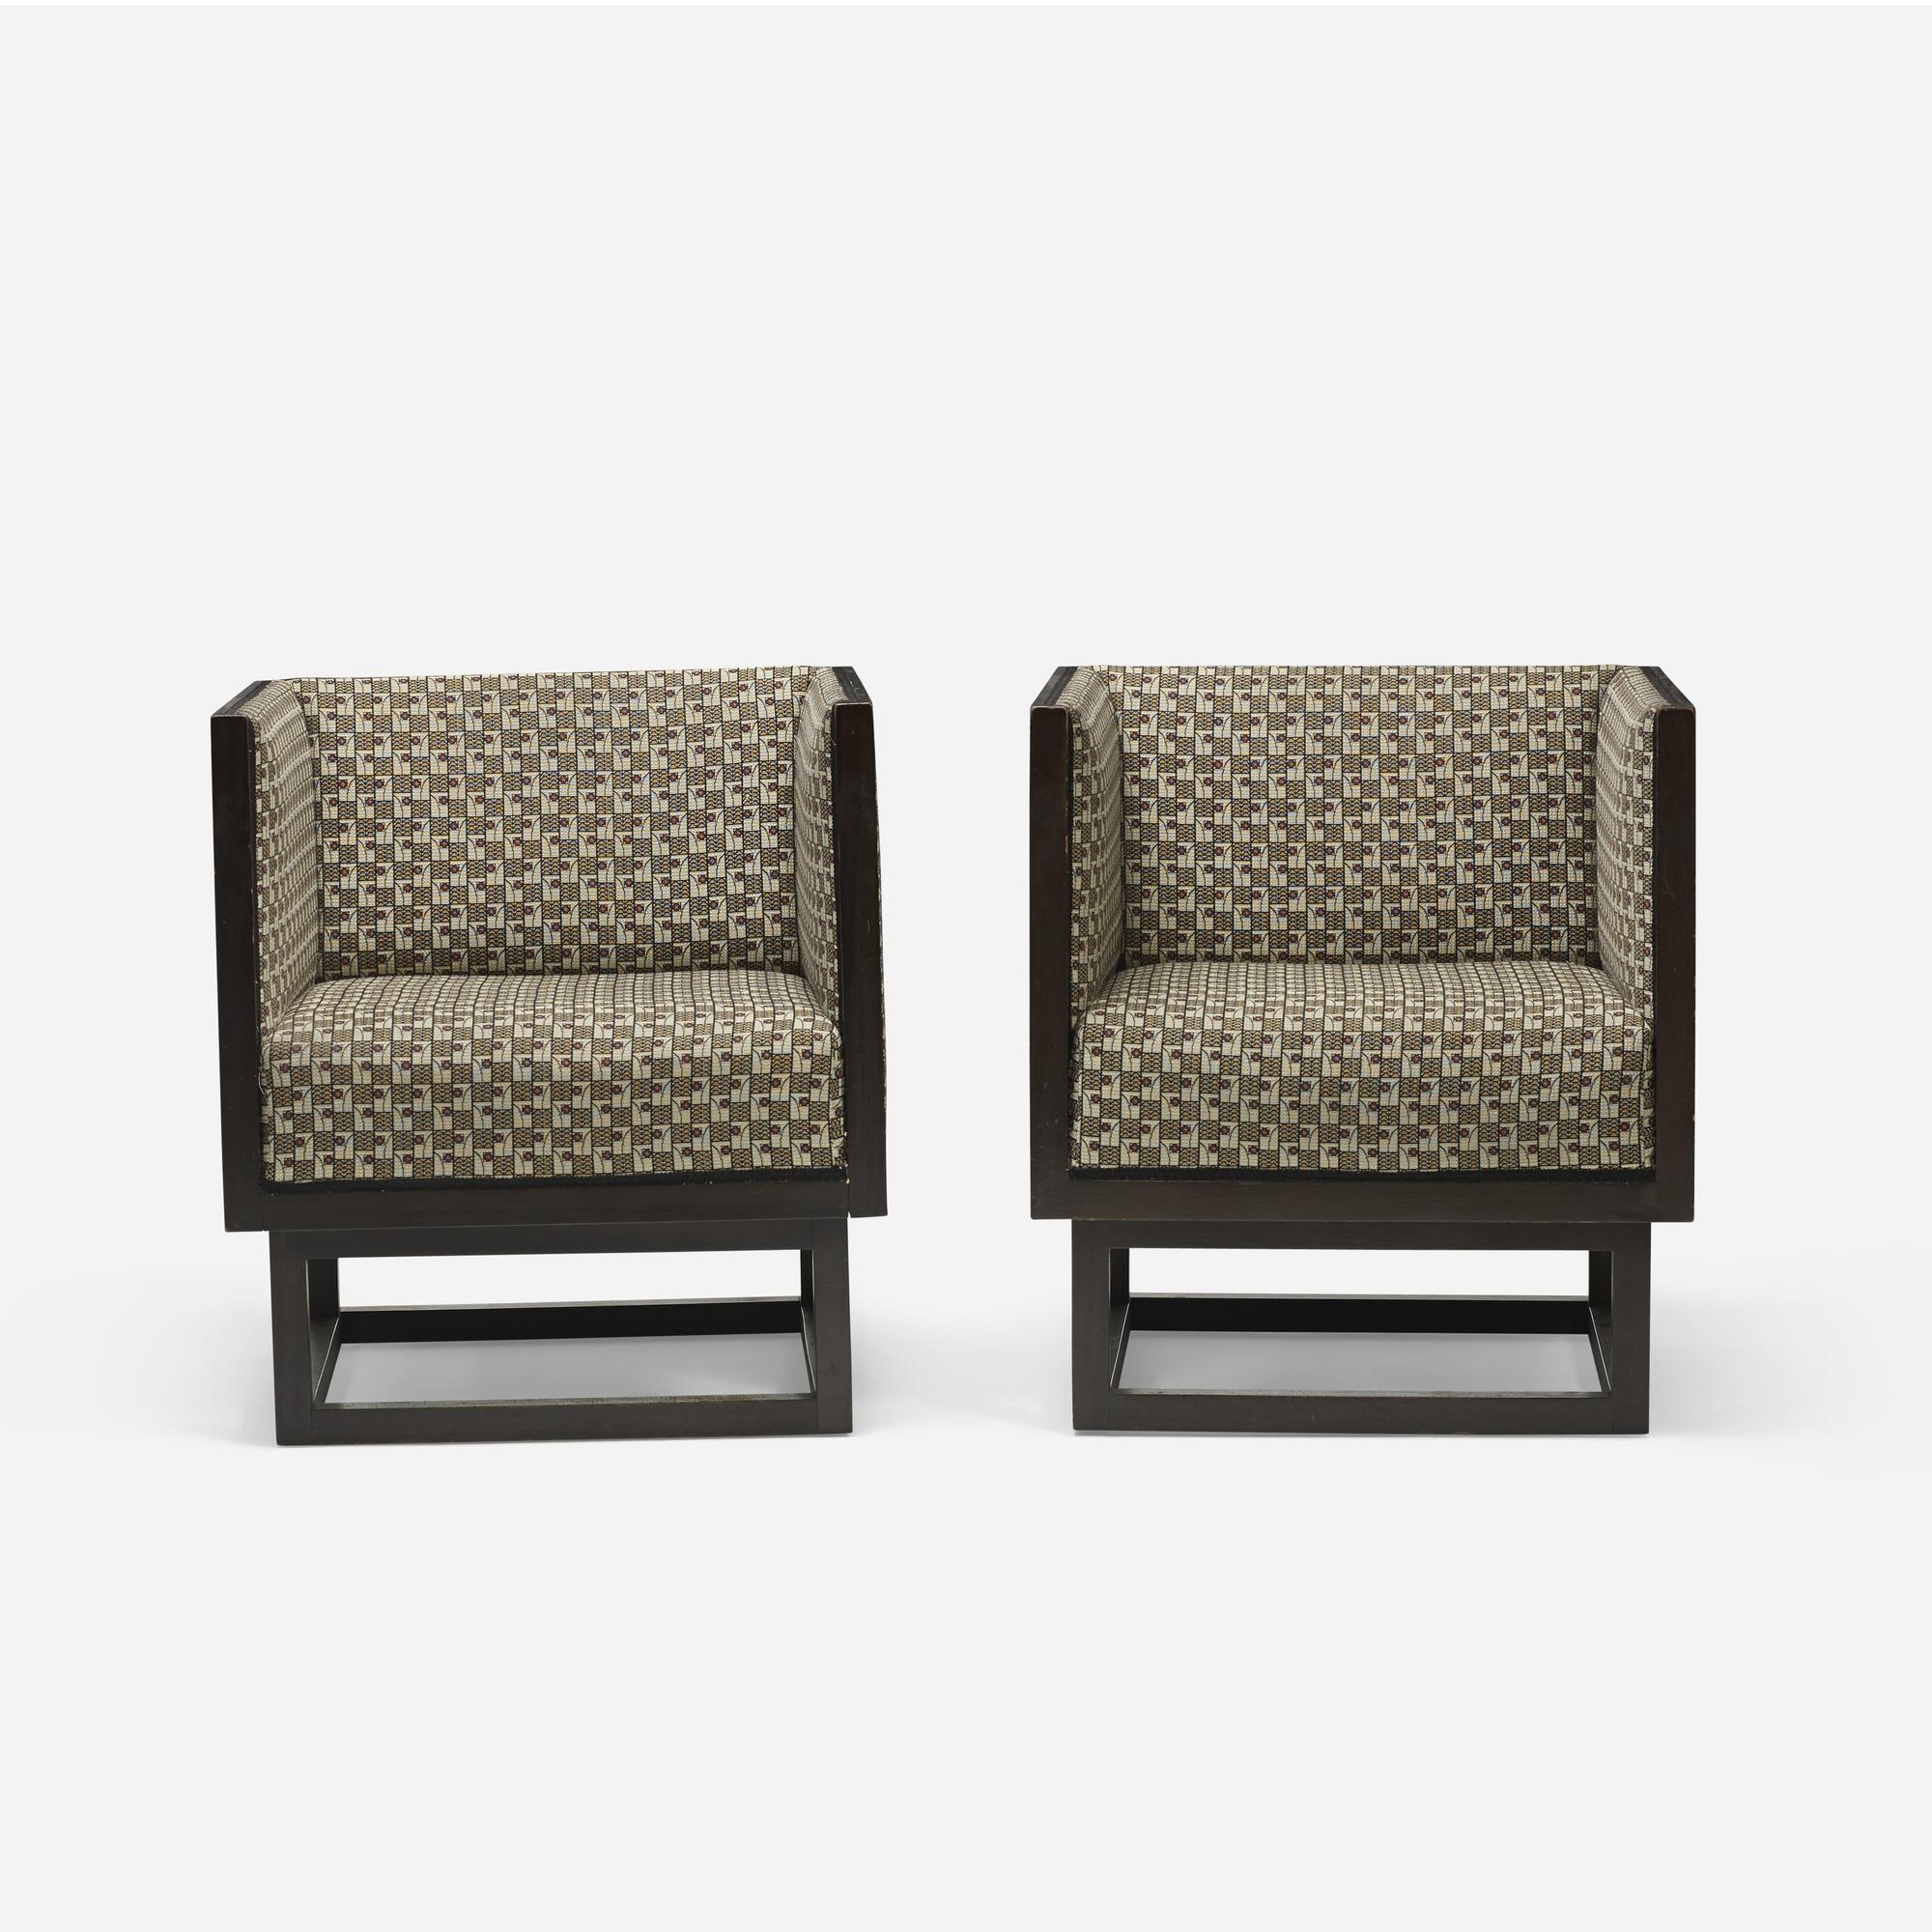 355: Josef Hoffmann / Cabinett lounge chairs, pair (2 of 5)